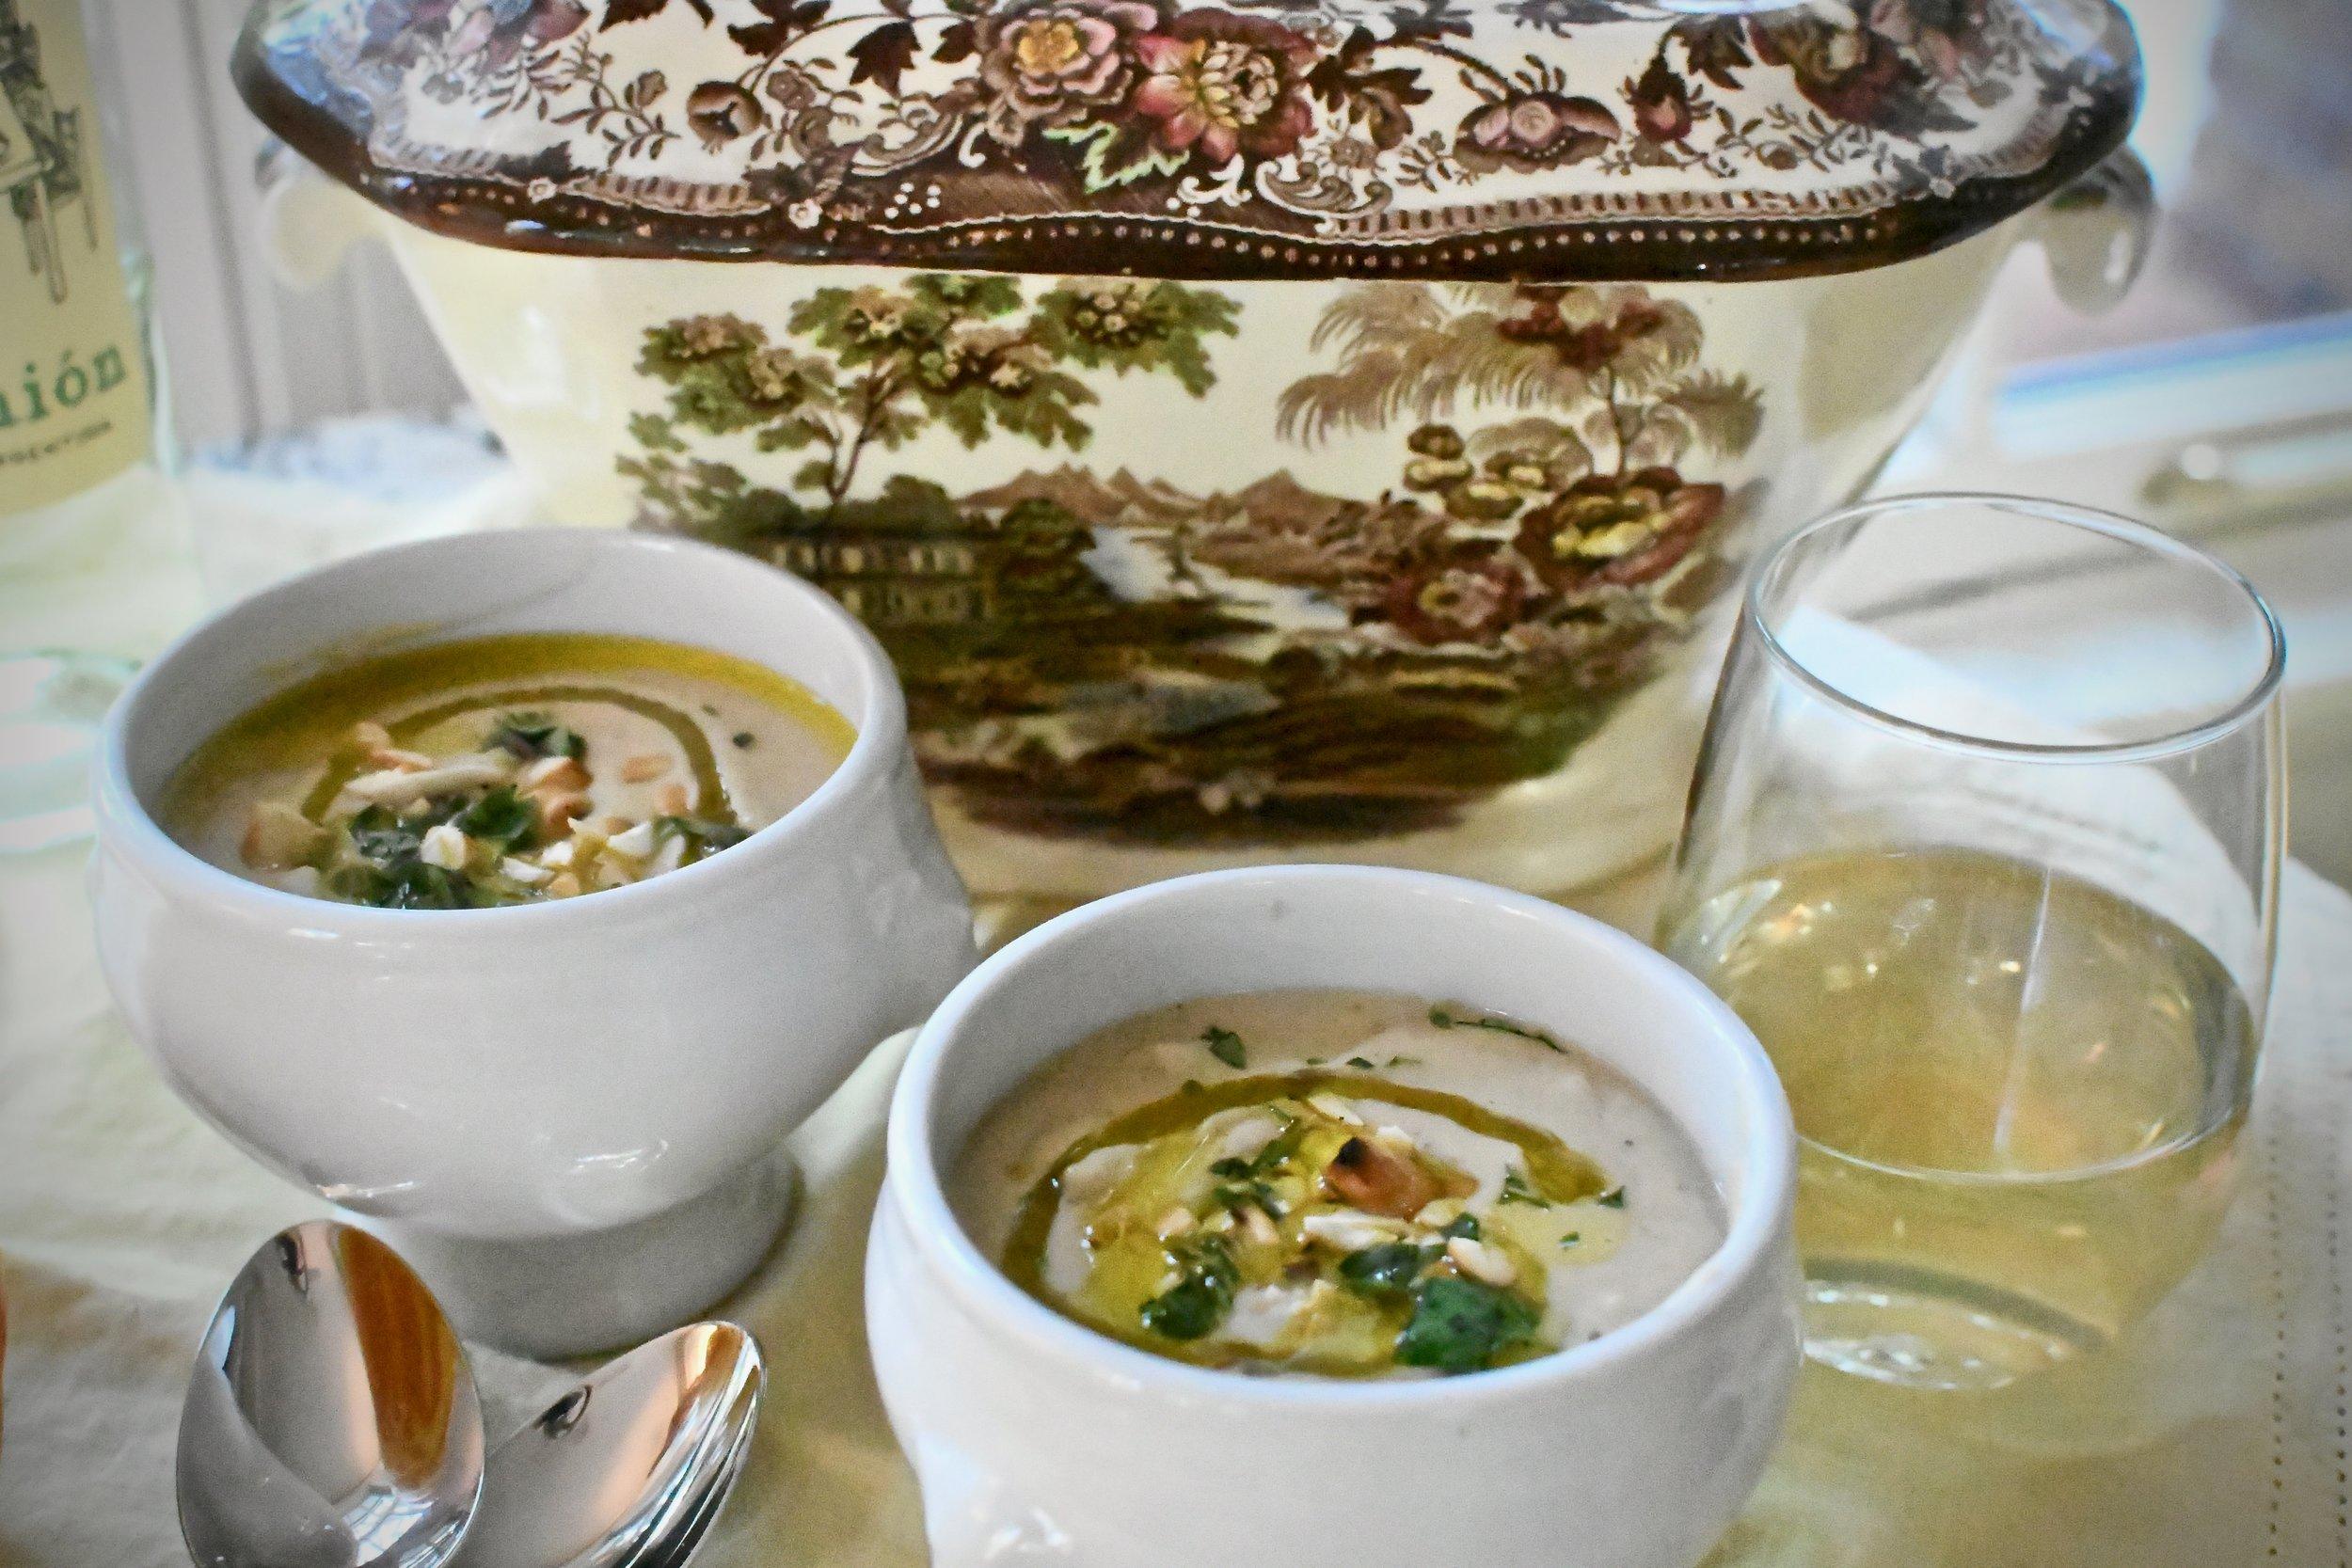 Roasted Cauliflower Soup - Crazy Blonde Life Style